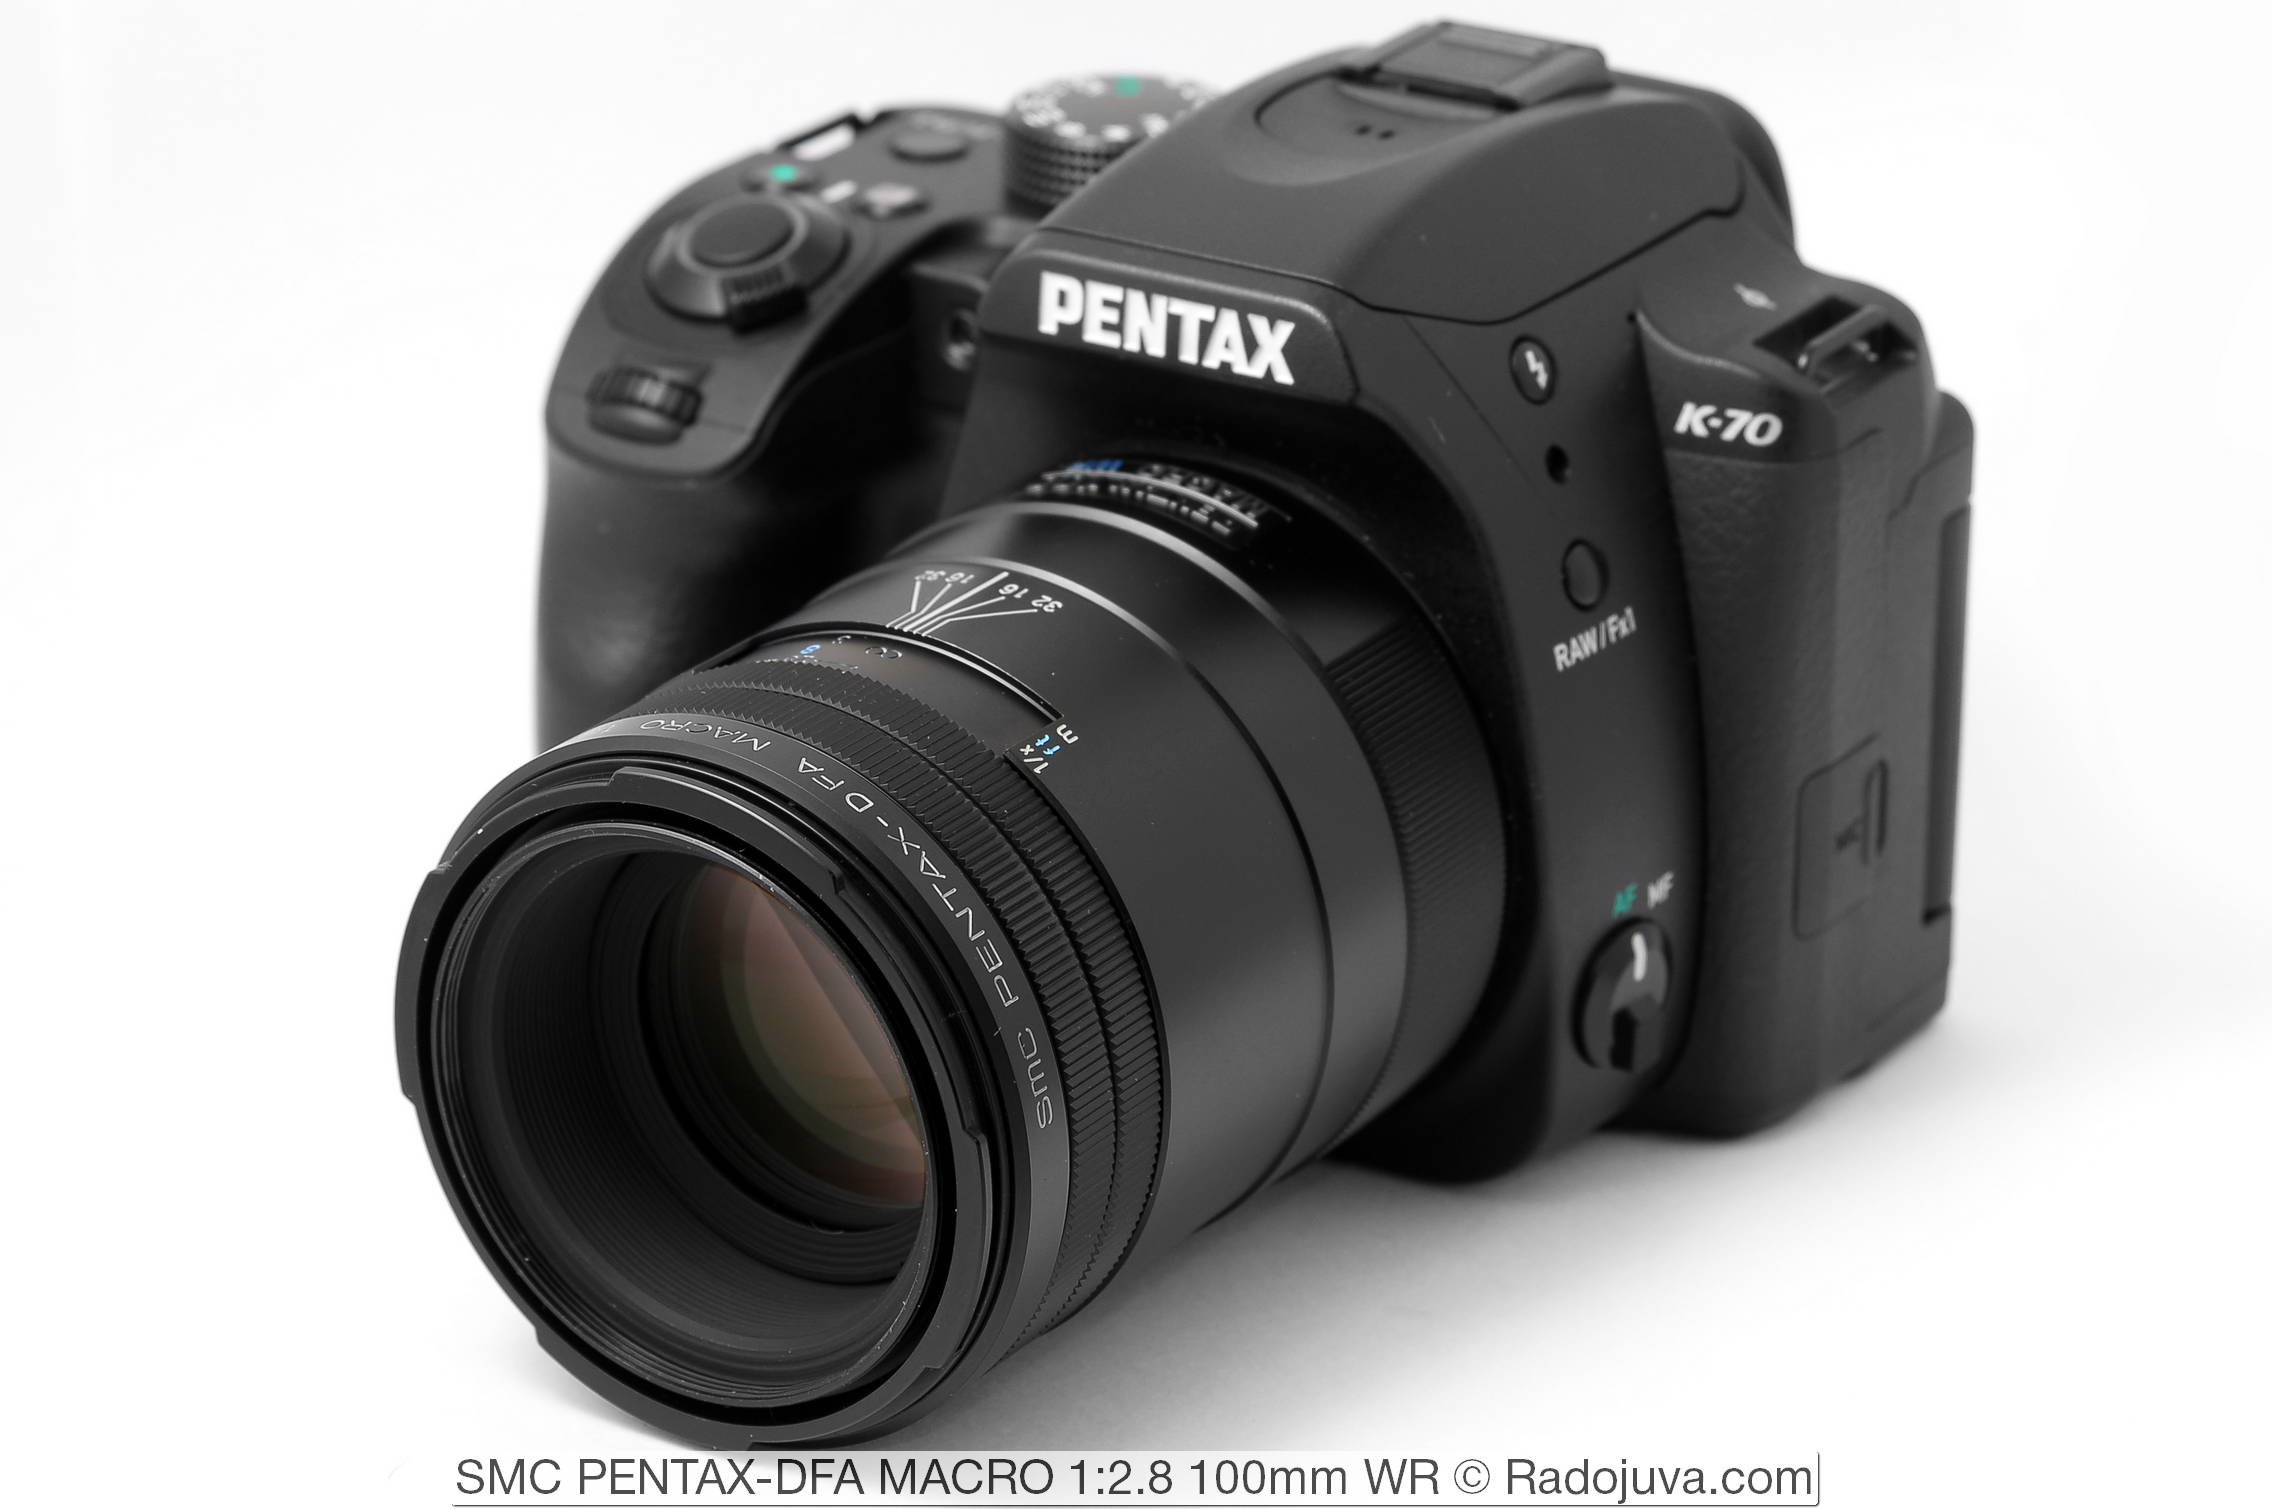 SMC PENTAX-DFA MACRO 1:2.8 100mm WR